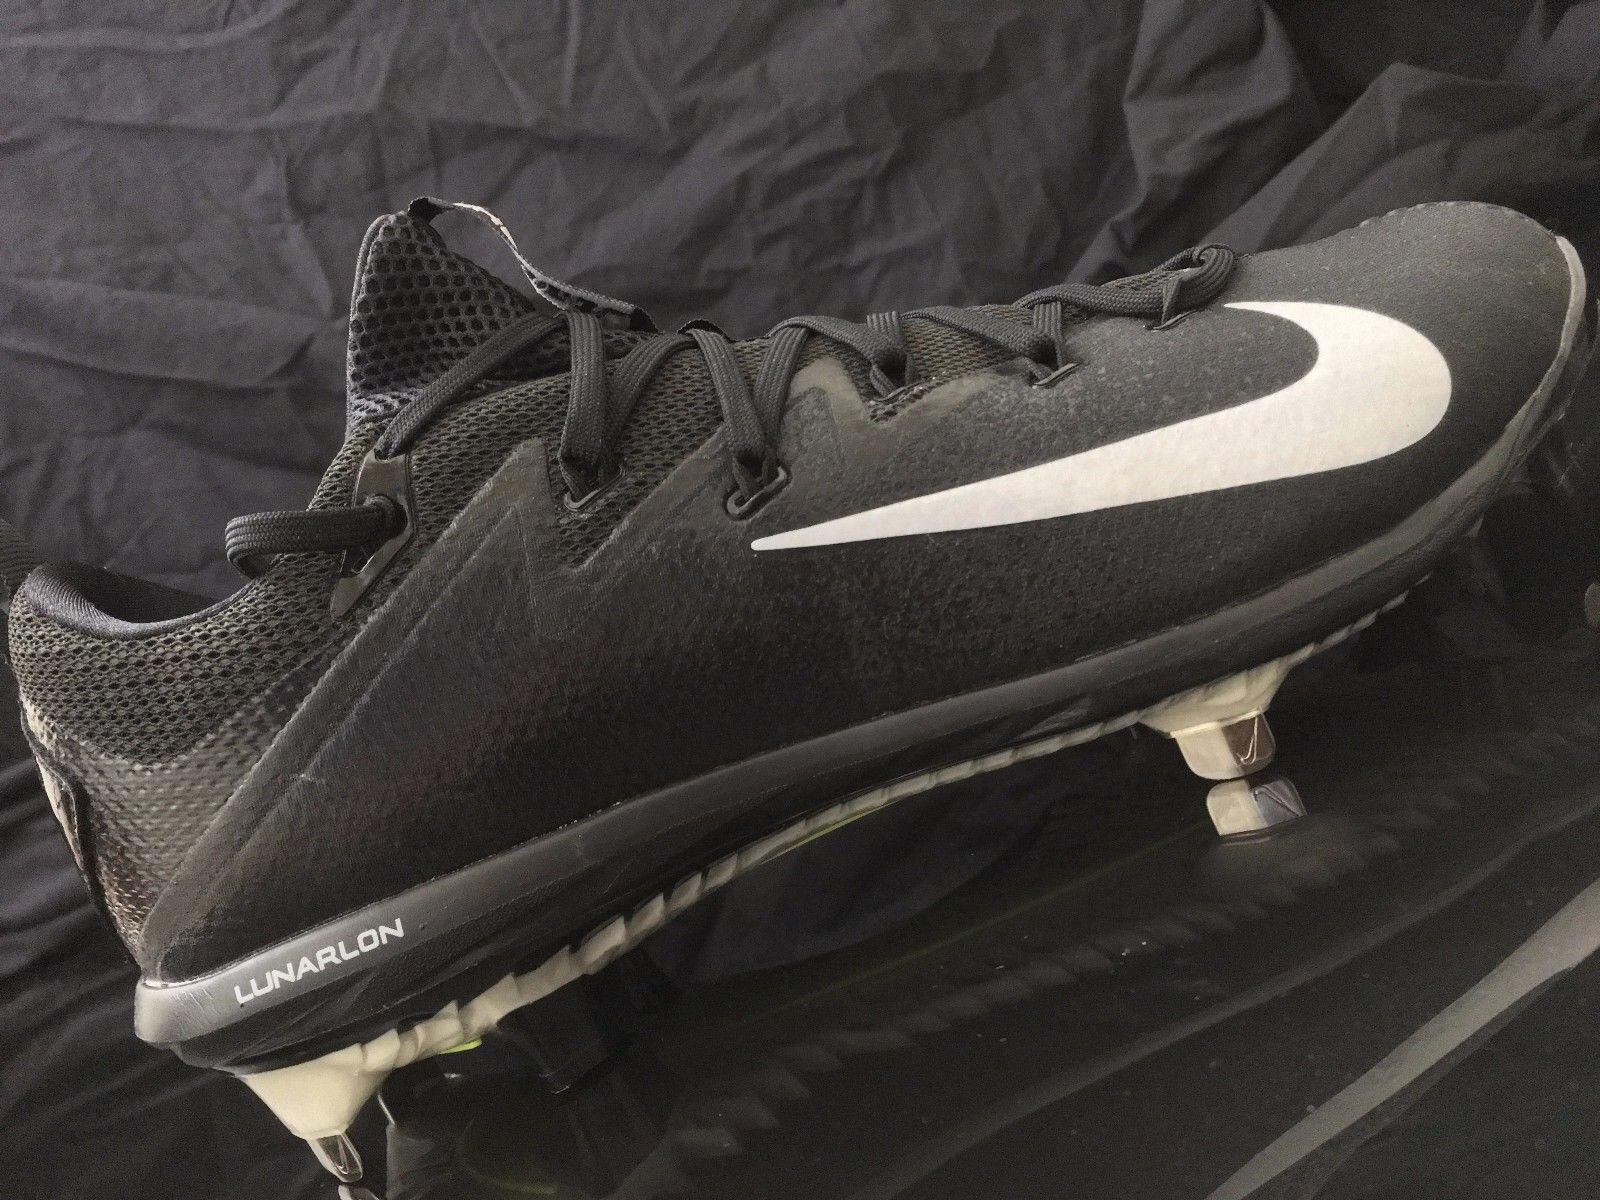 Nike lunar vapore baseball ultrafly elite uomini scarpe da baseball vapore 852686 010 sz 10, 11, 17 bf1e3b